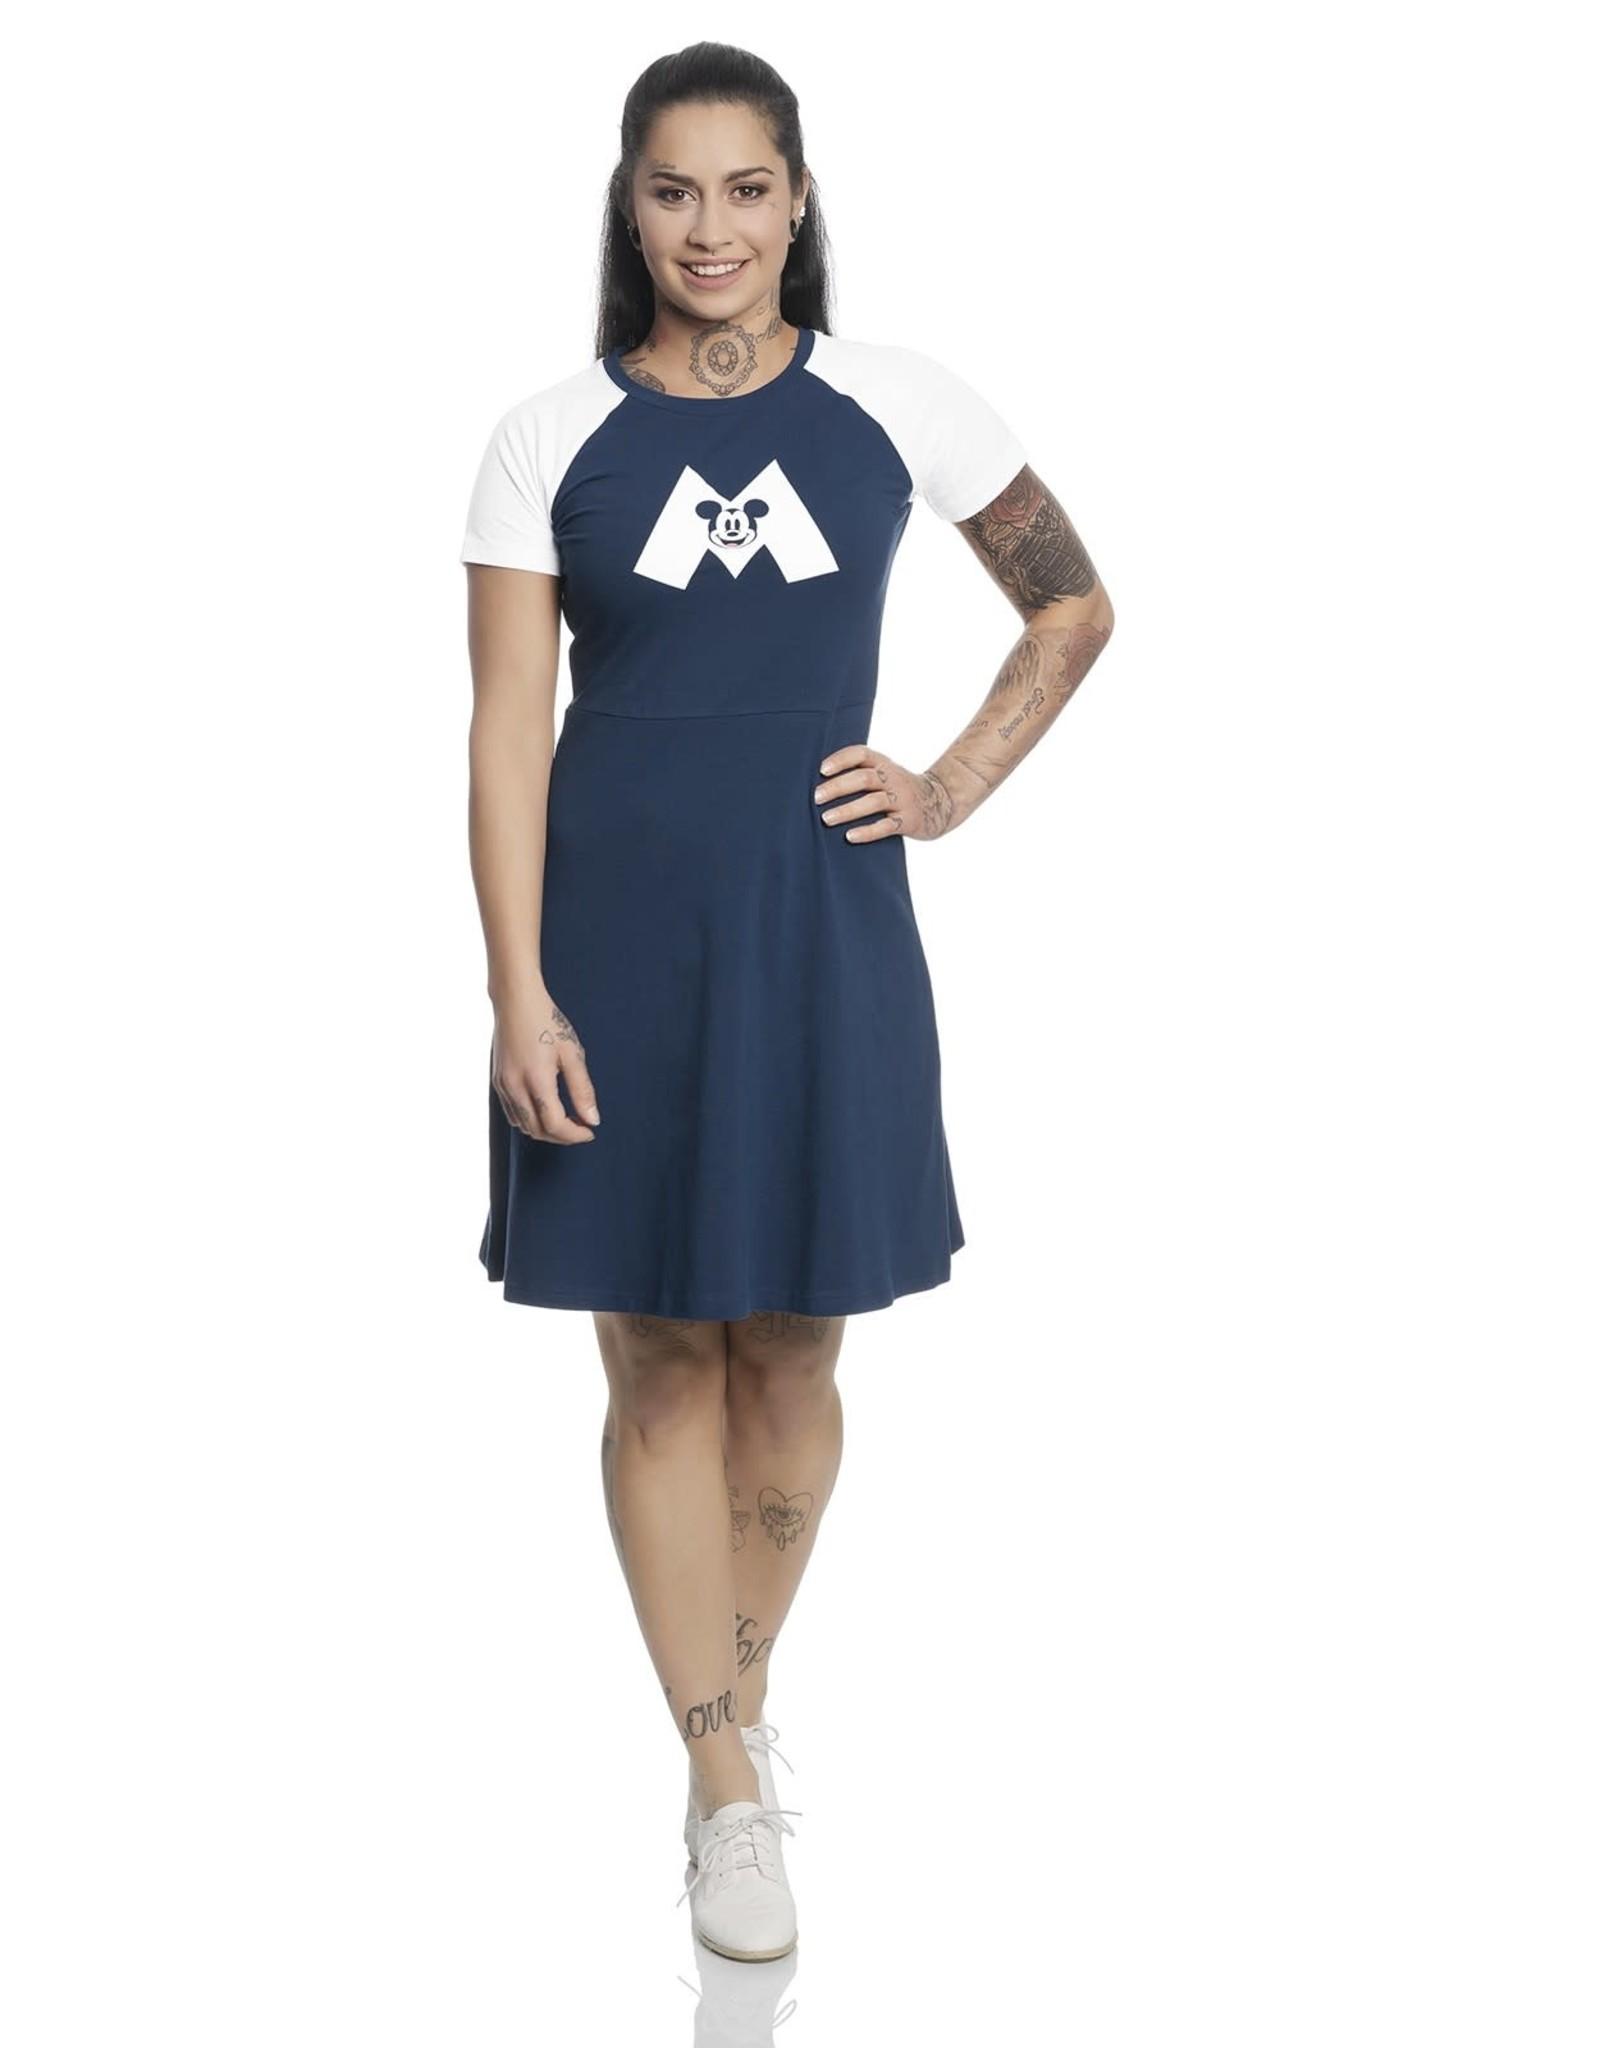 DISNEY - Mickey Mouse M College Dress Navy/White (M)